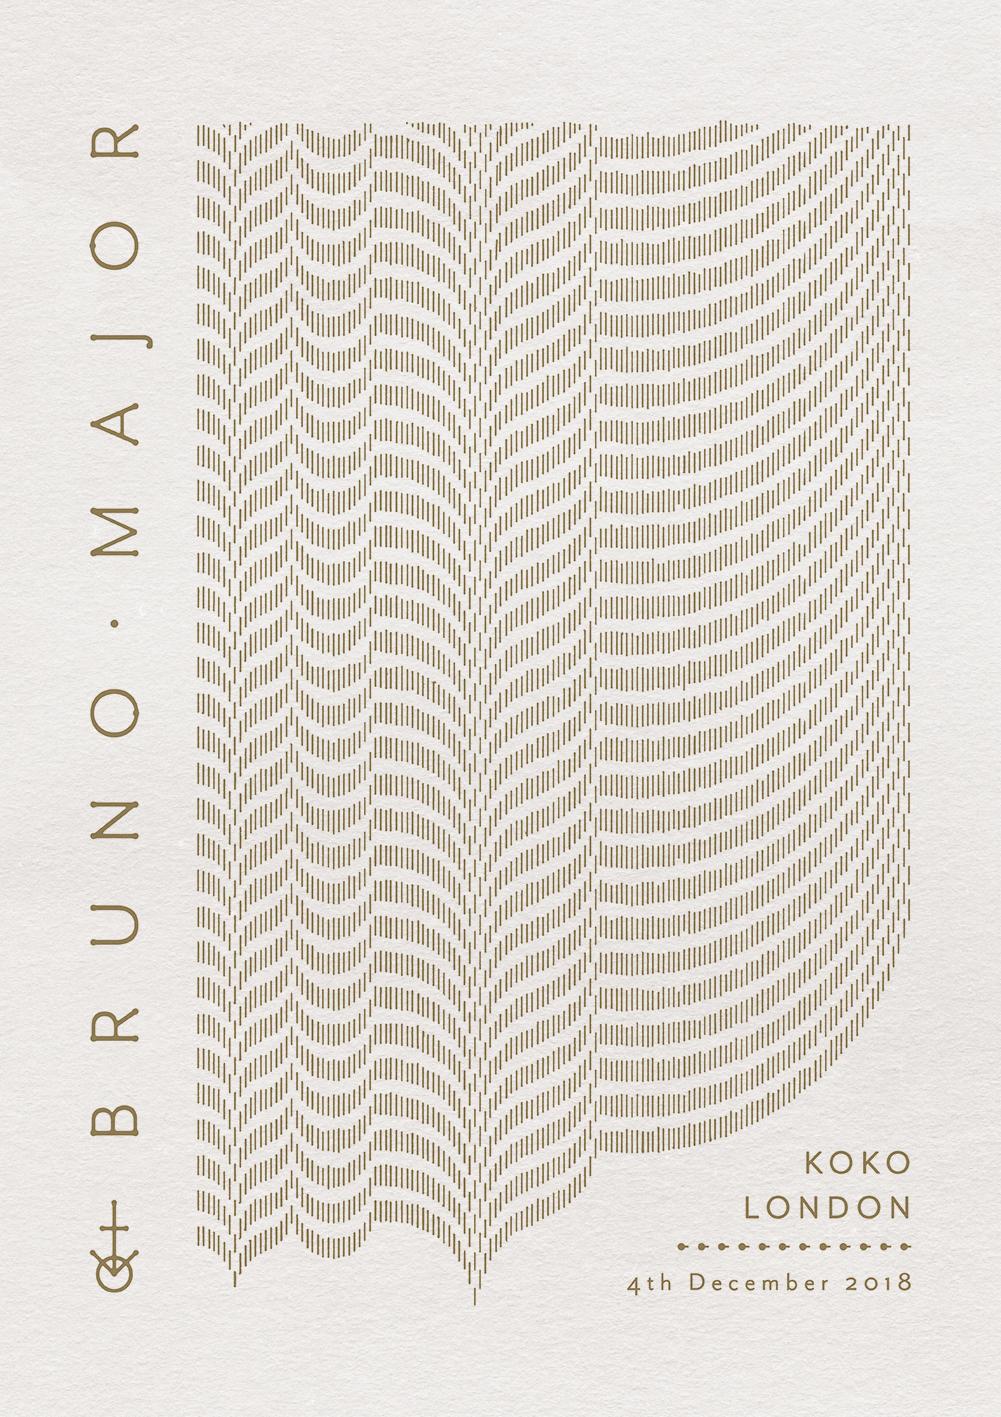 KOKO London Poster